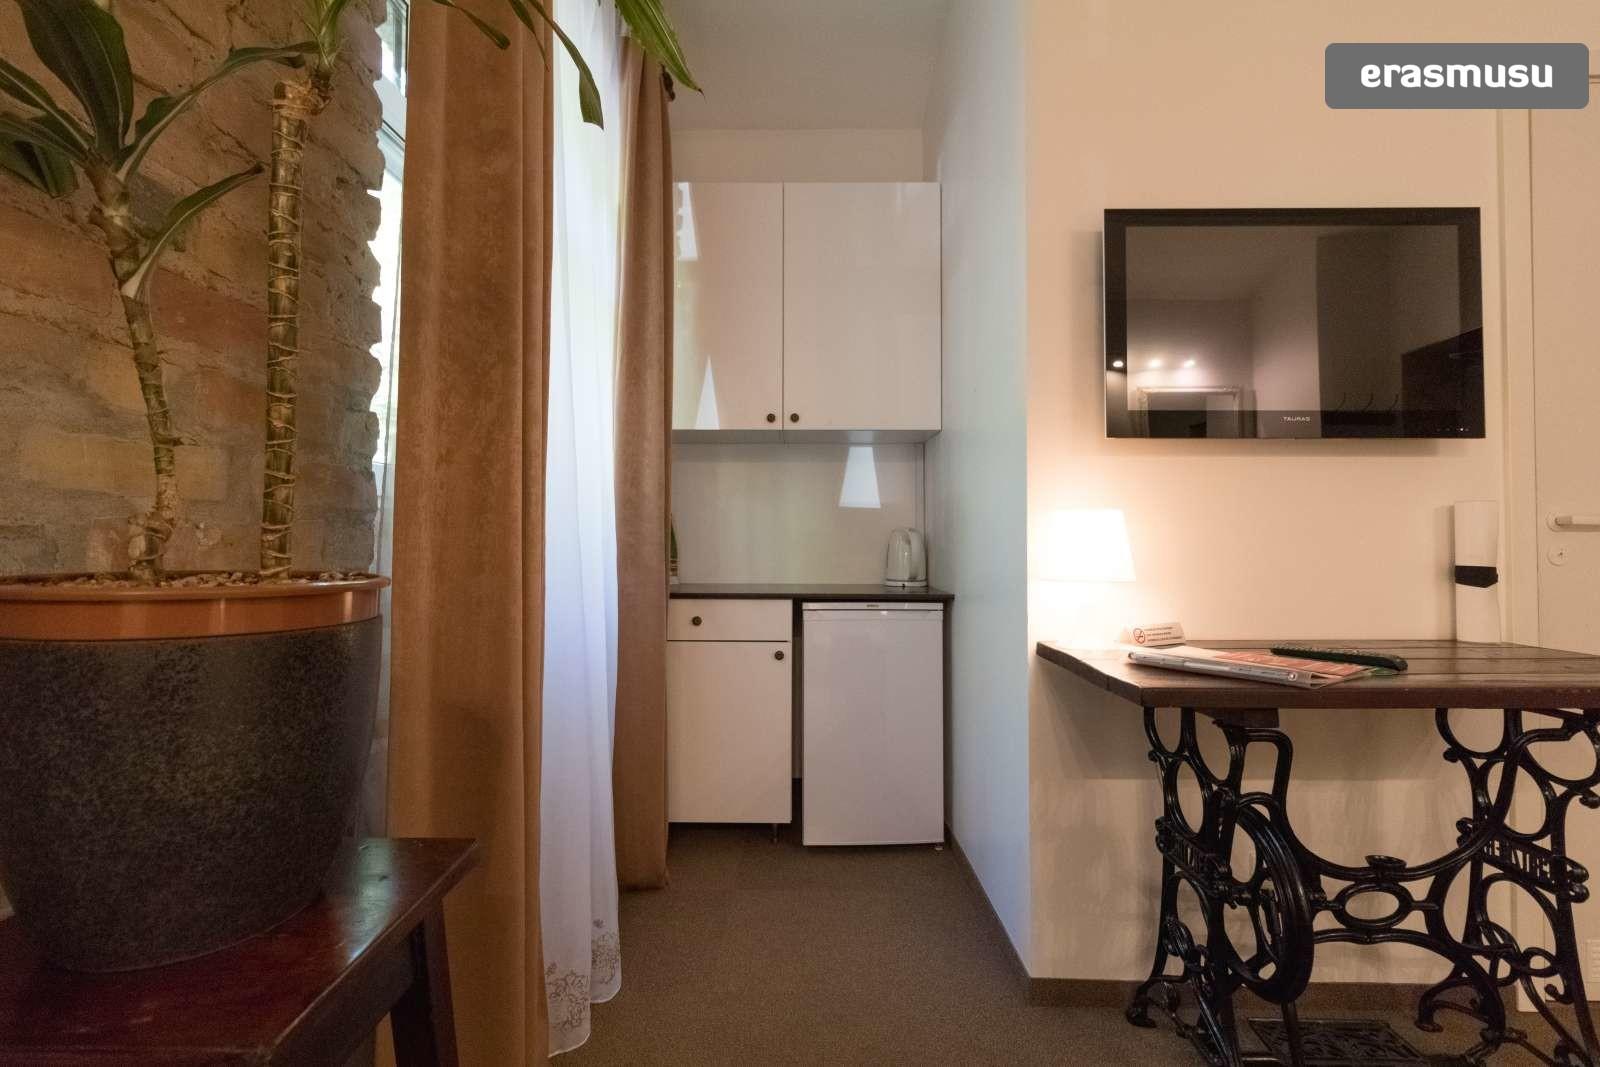 spacious-ensuite-room-kitchenette-rent-agenskalns-7fe3d4f2262678